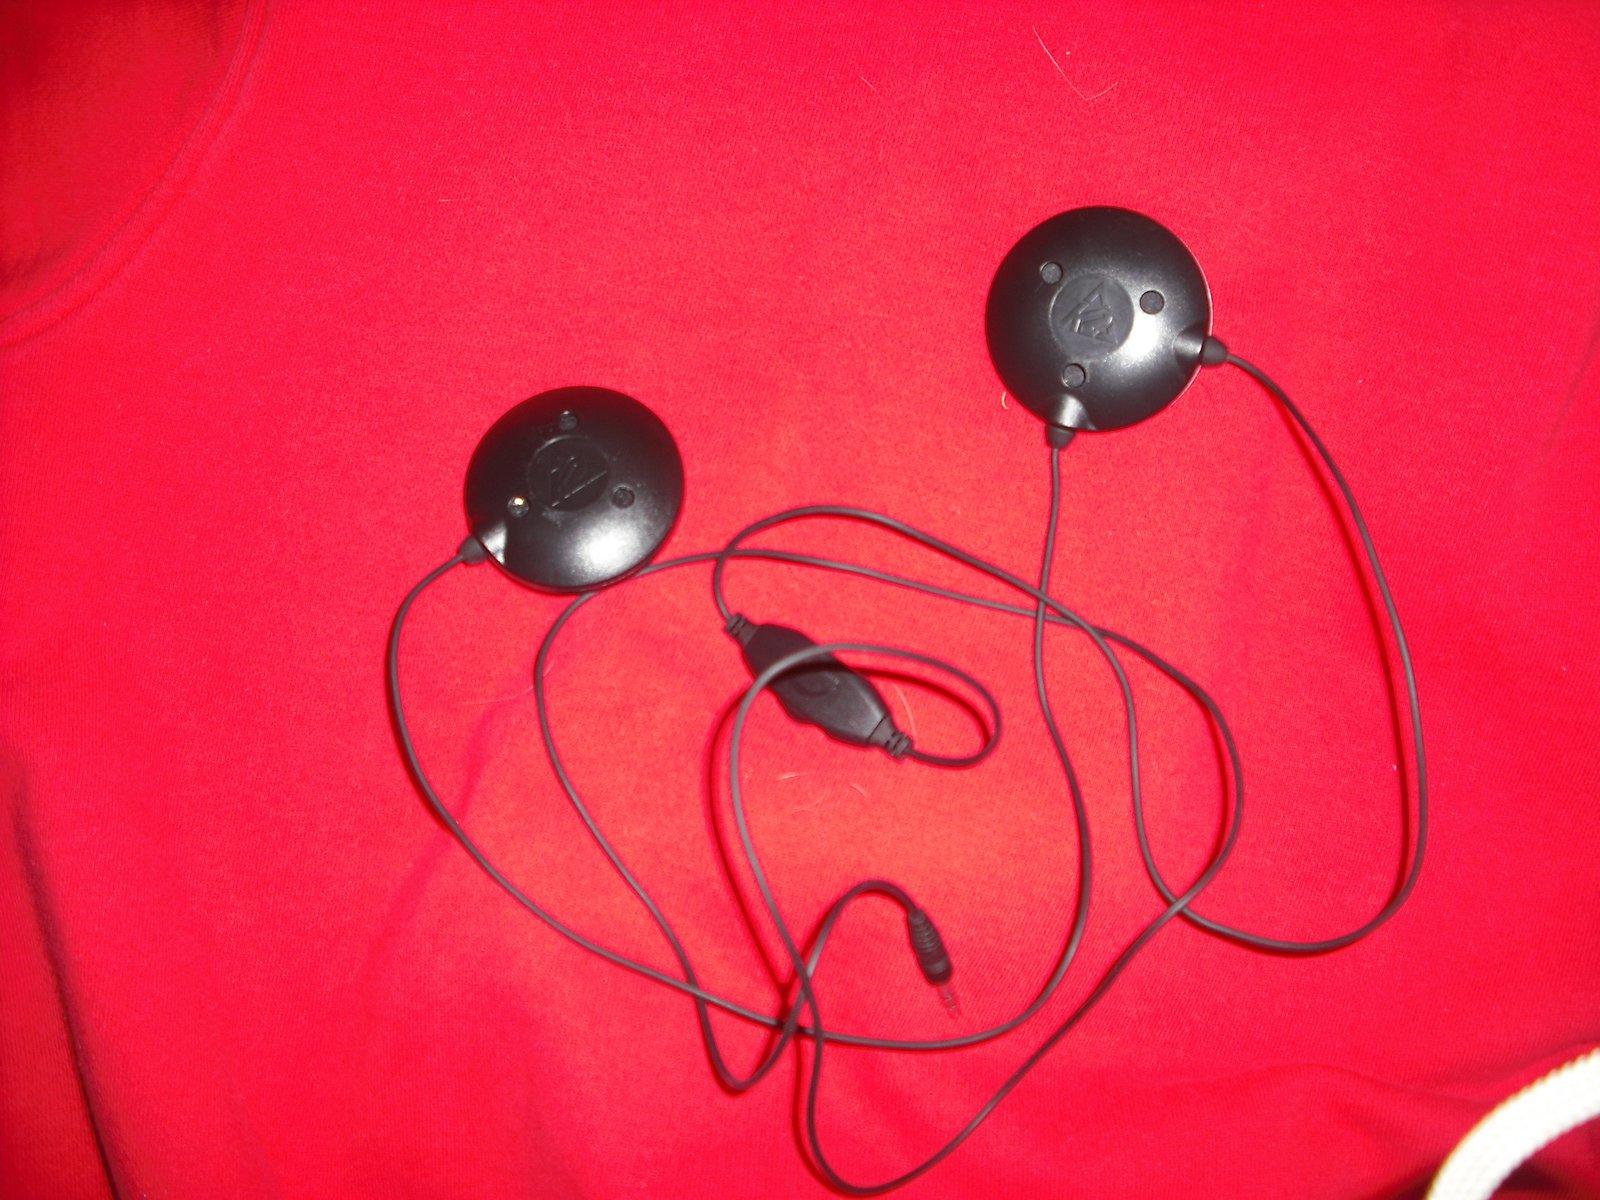 K2 rant audio kit